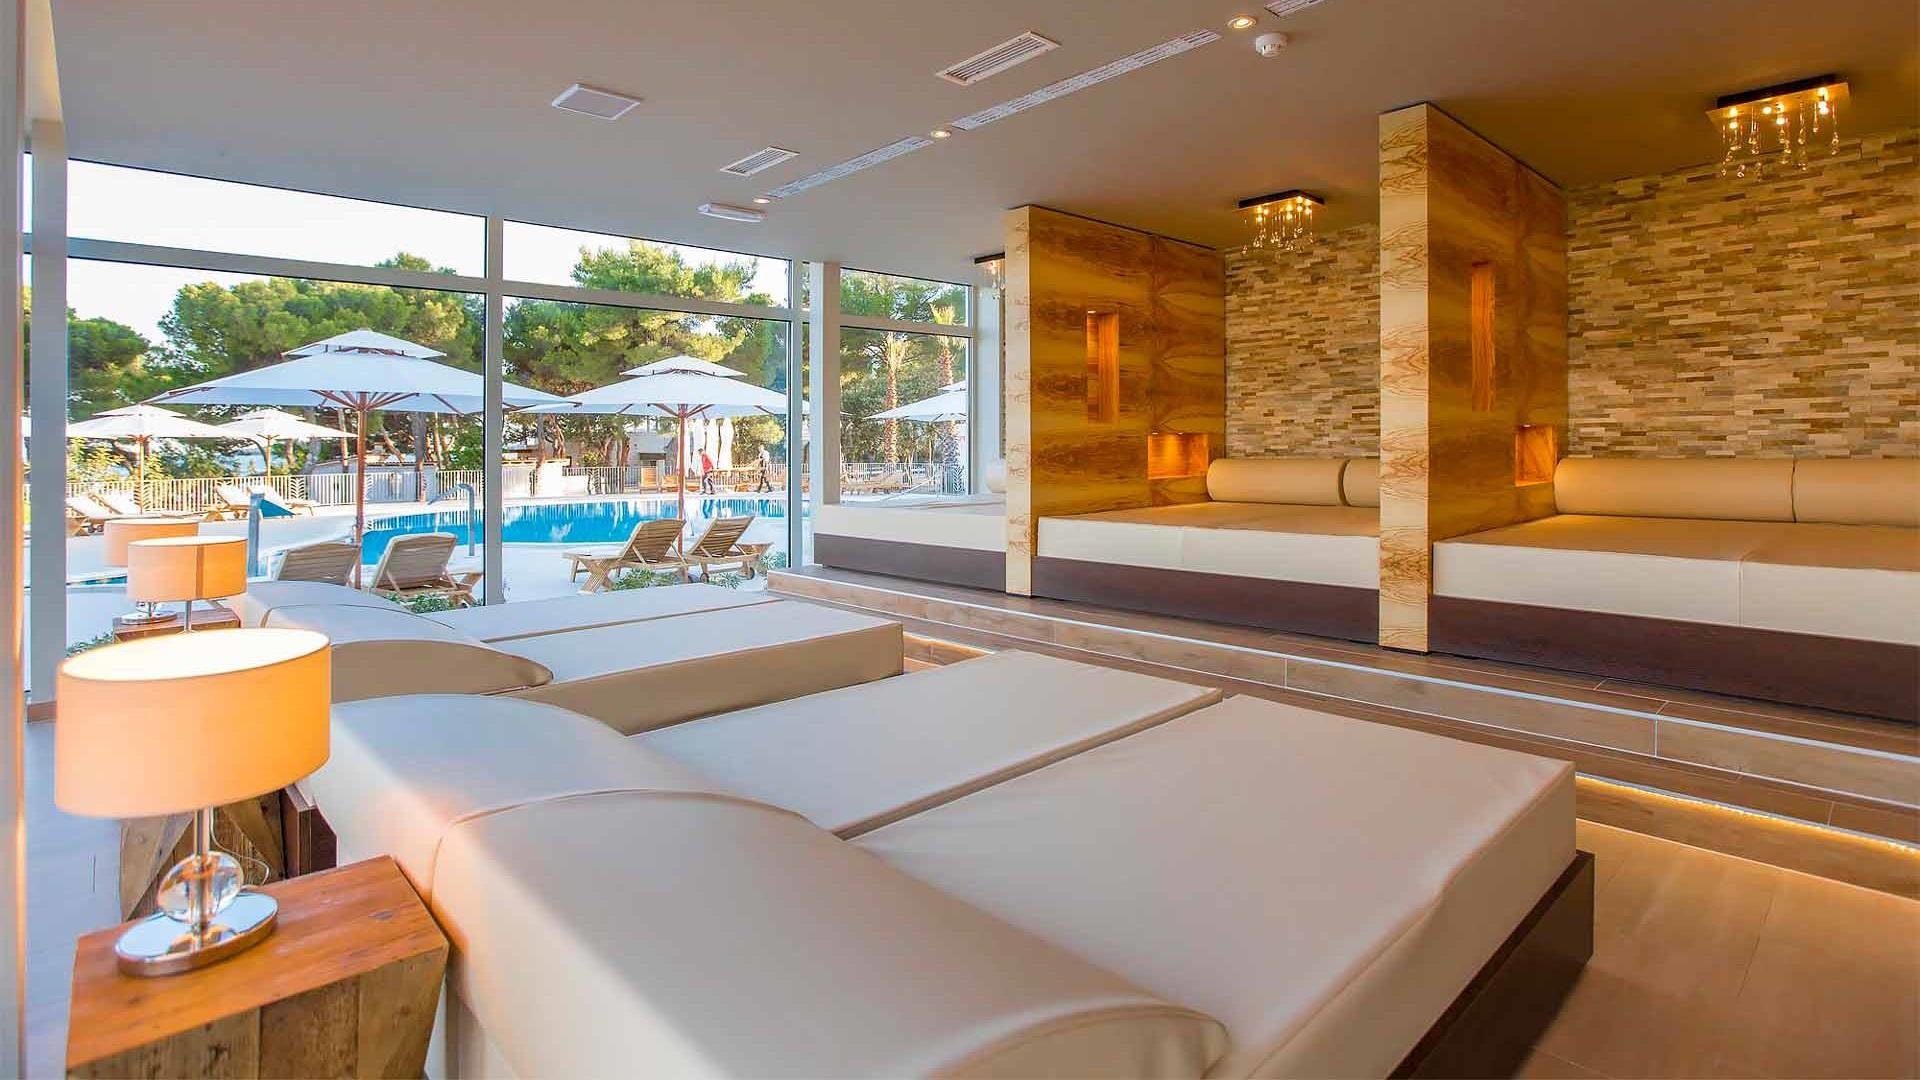 Spa Jure Massage & Spa Treatments